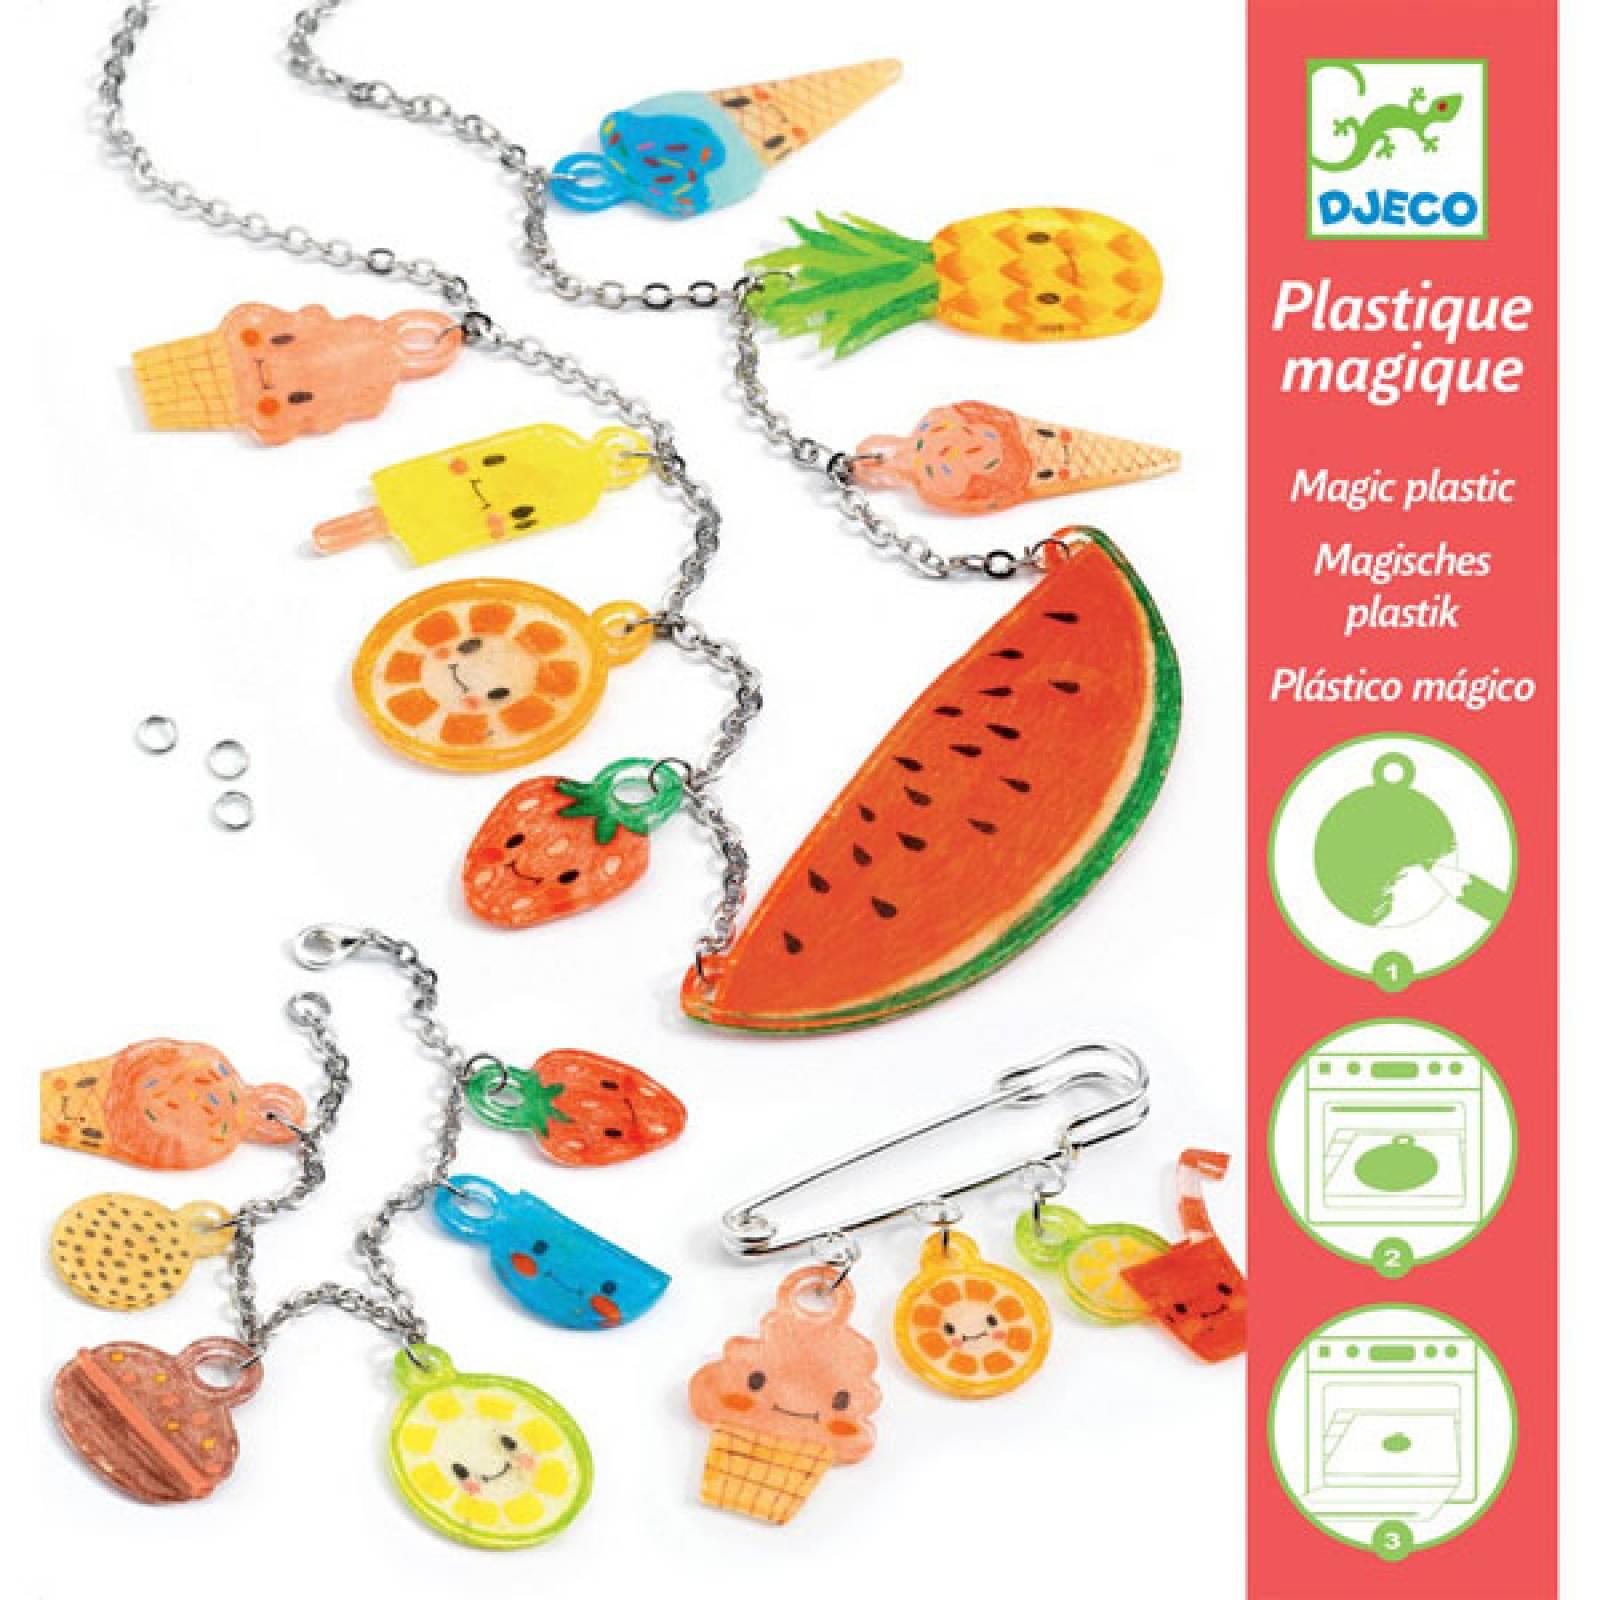 Sweet Treats Magic Plastic Kit By Djeco 7-13yrs